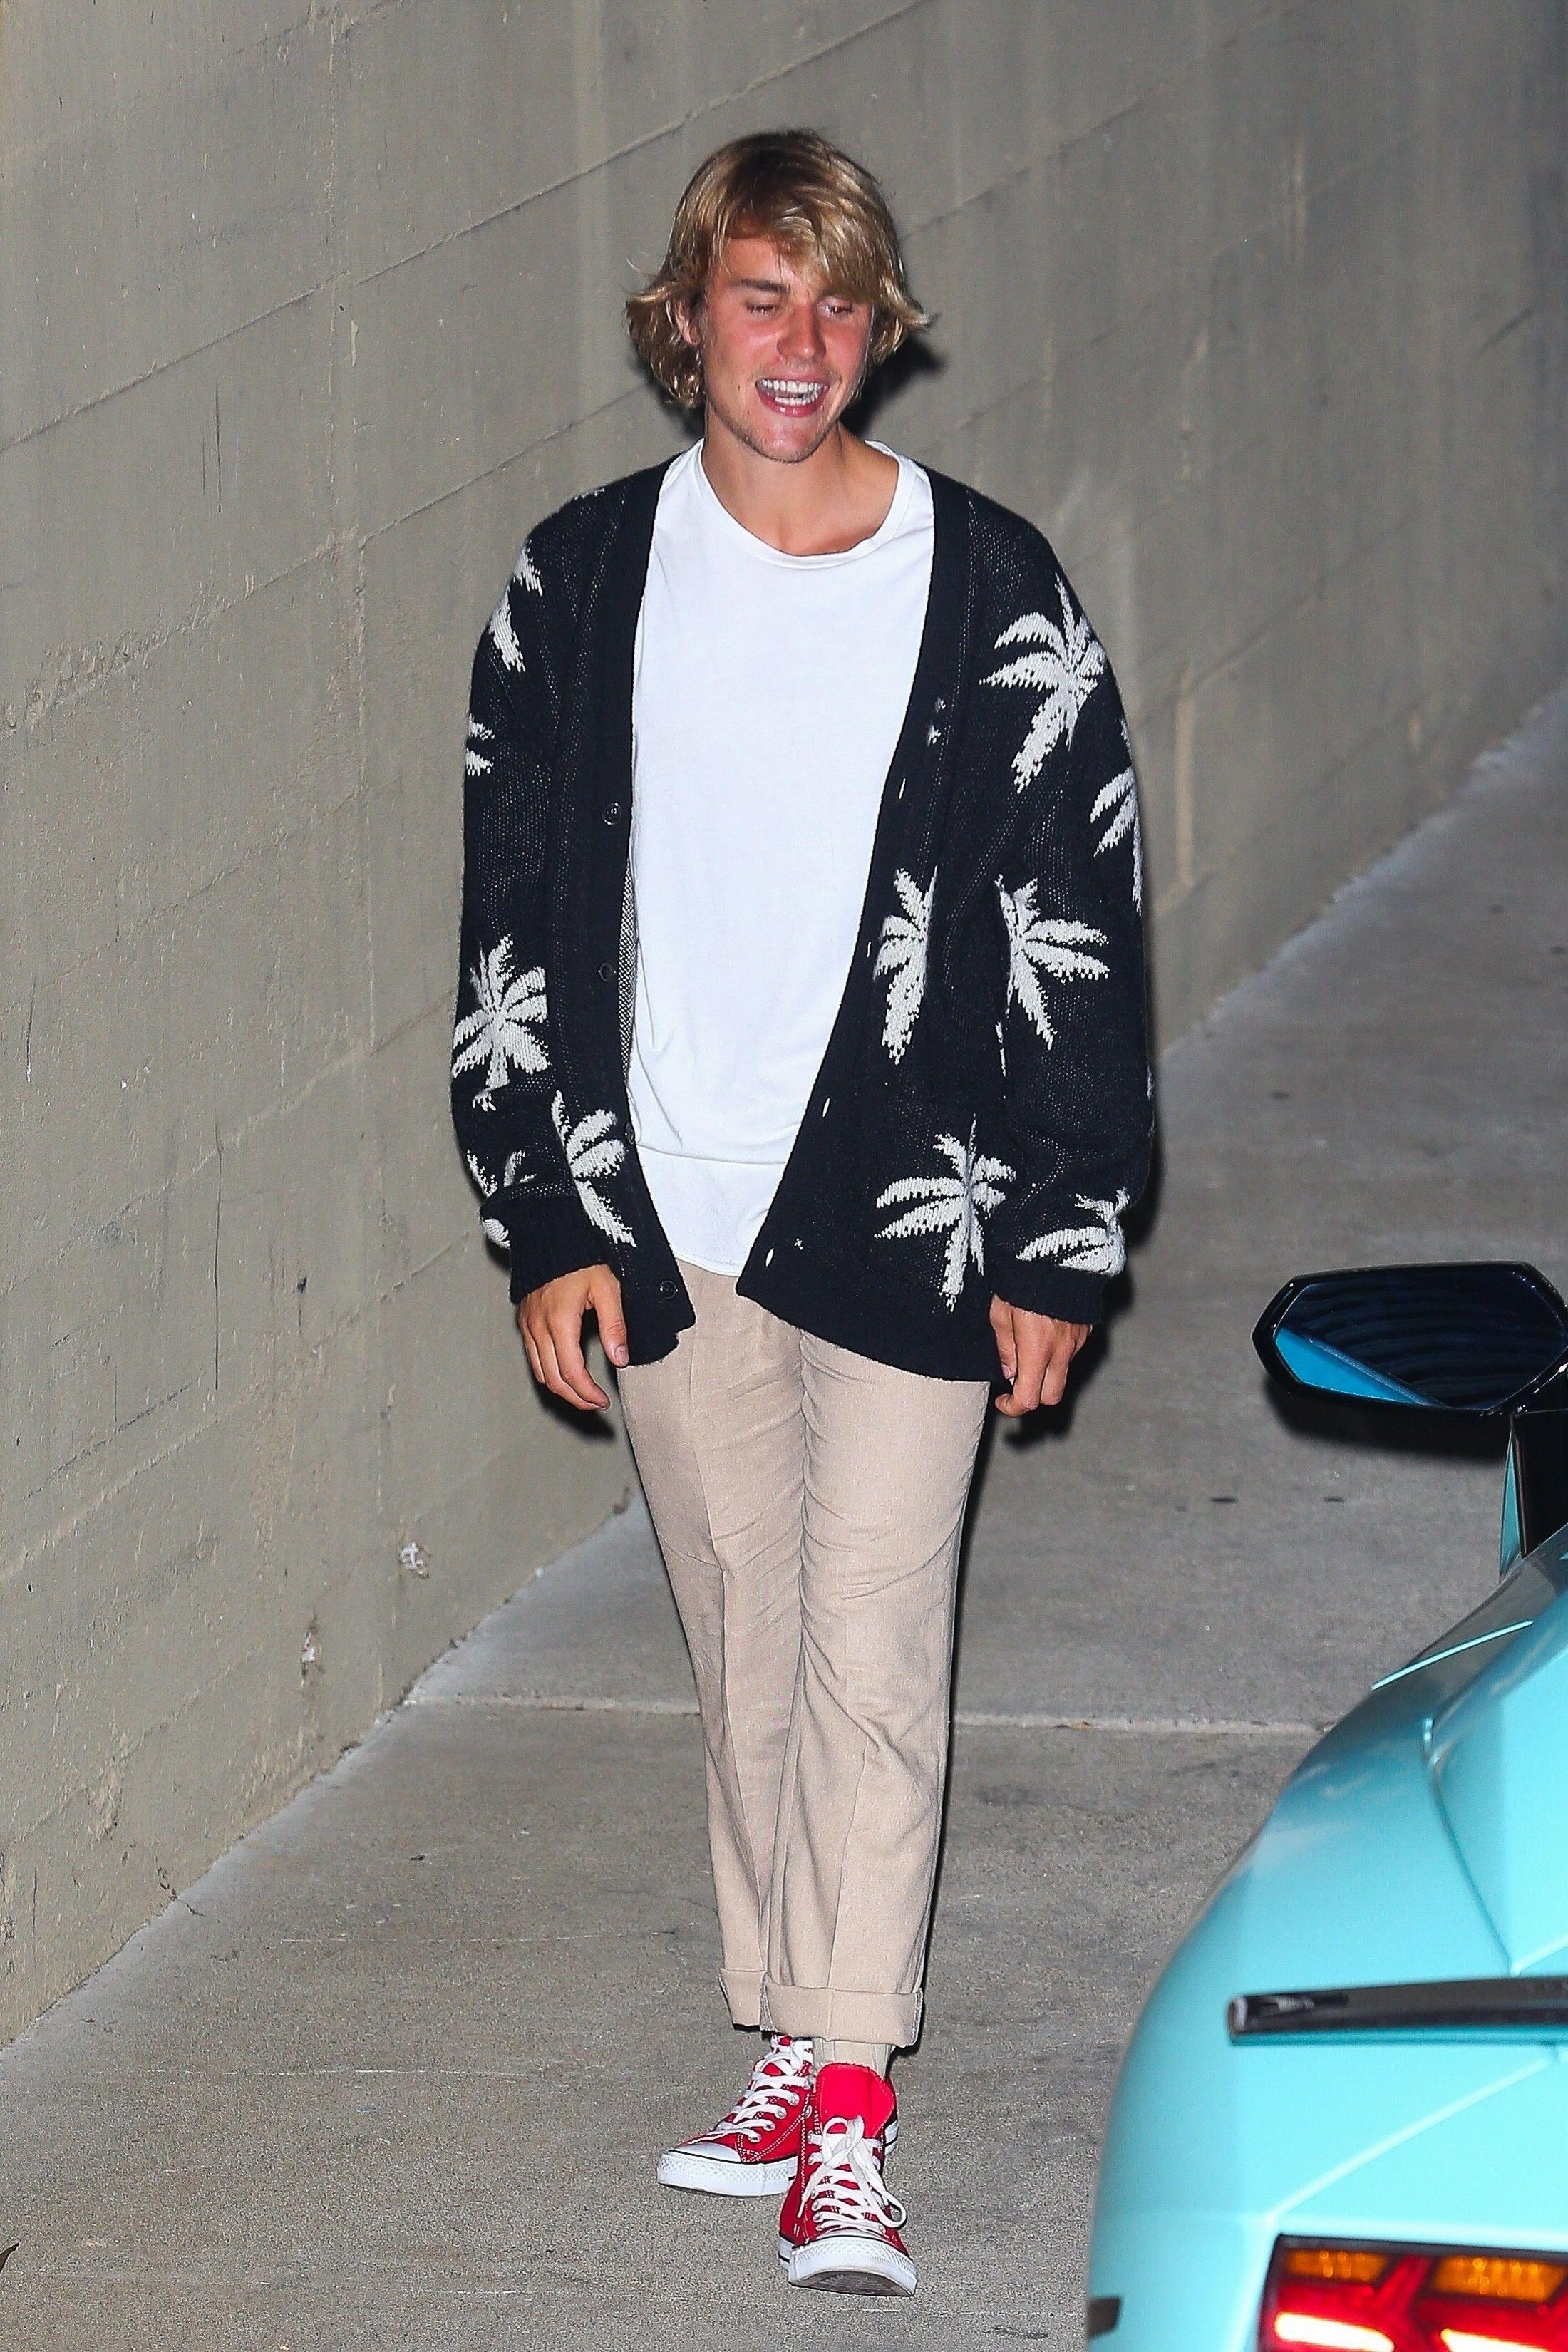 b3f2ff6be1a8 Justin Bieber wearing Amiri Palm Cardigan